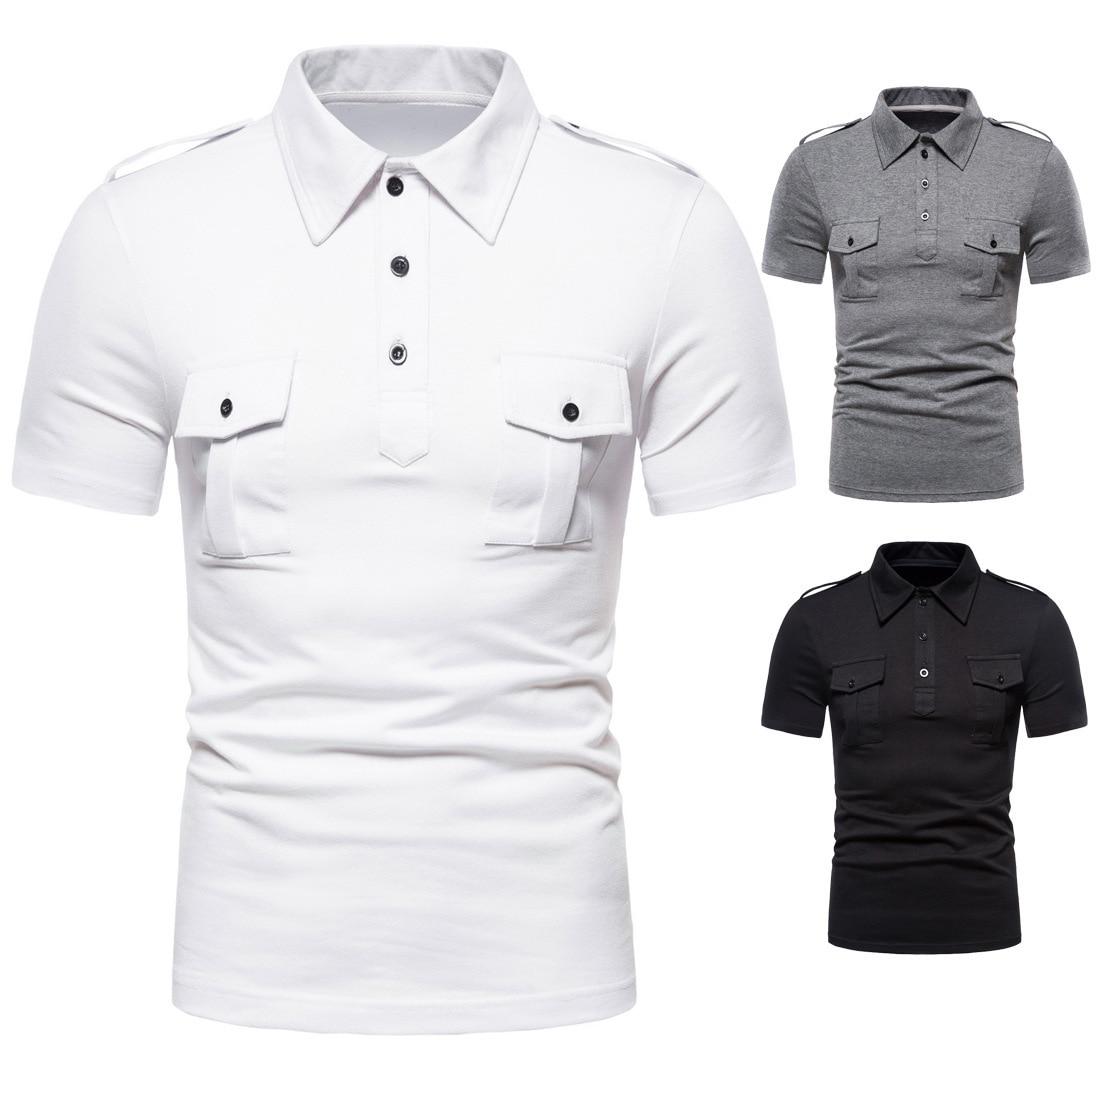 Polos nova marca casual cor sólida duplo bolso polo carga treinamento de combate camisa polo para homens verão topos